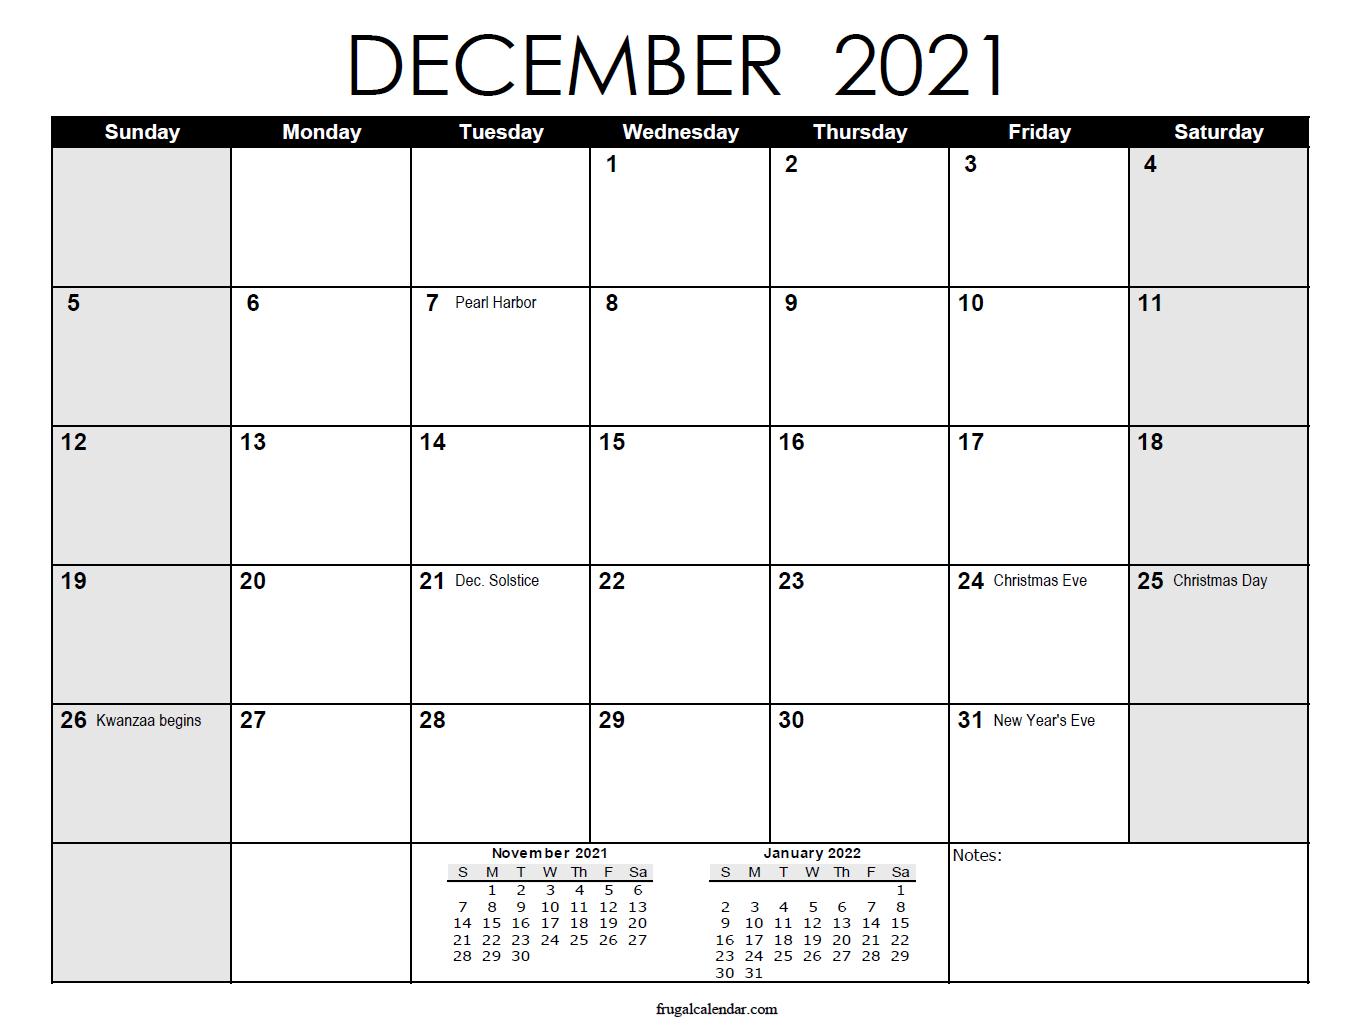 December Calendar 2021 | 2021 Calendars Printable